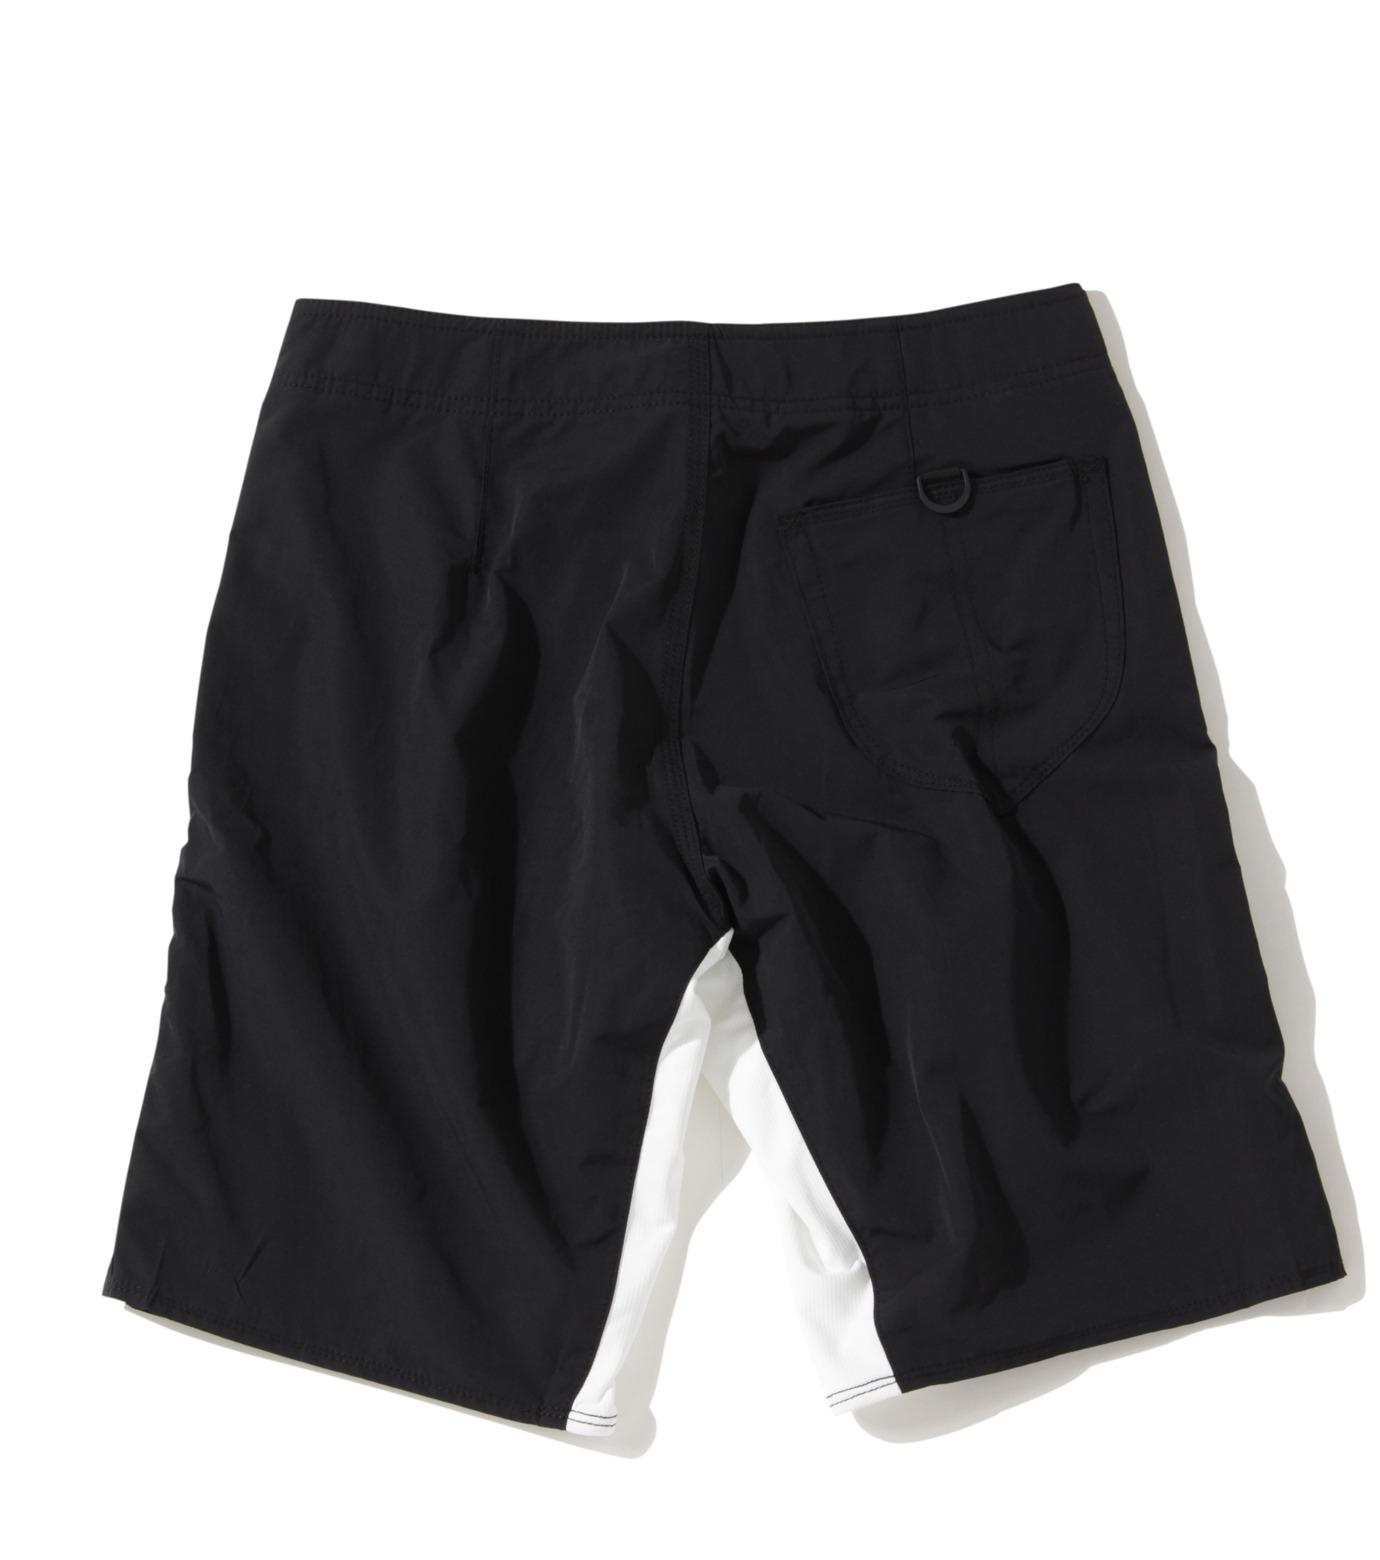 TWO TWO ONE(トゥートゥーワン)のSurf shorts long-WHITE(SWIMWEAR/SWIMWEAR)-15N948002-4 拡大詳細画像2